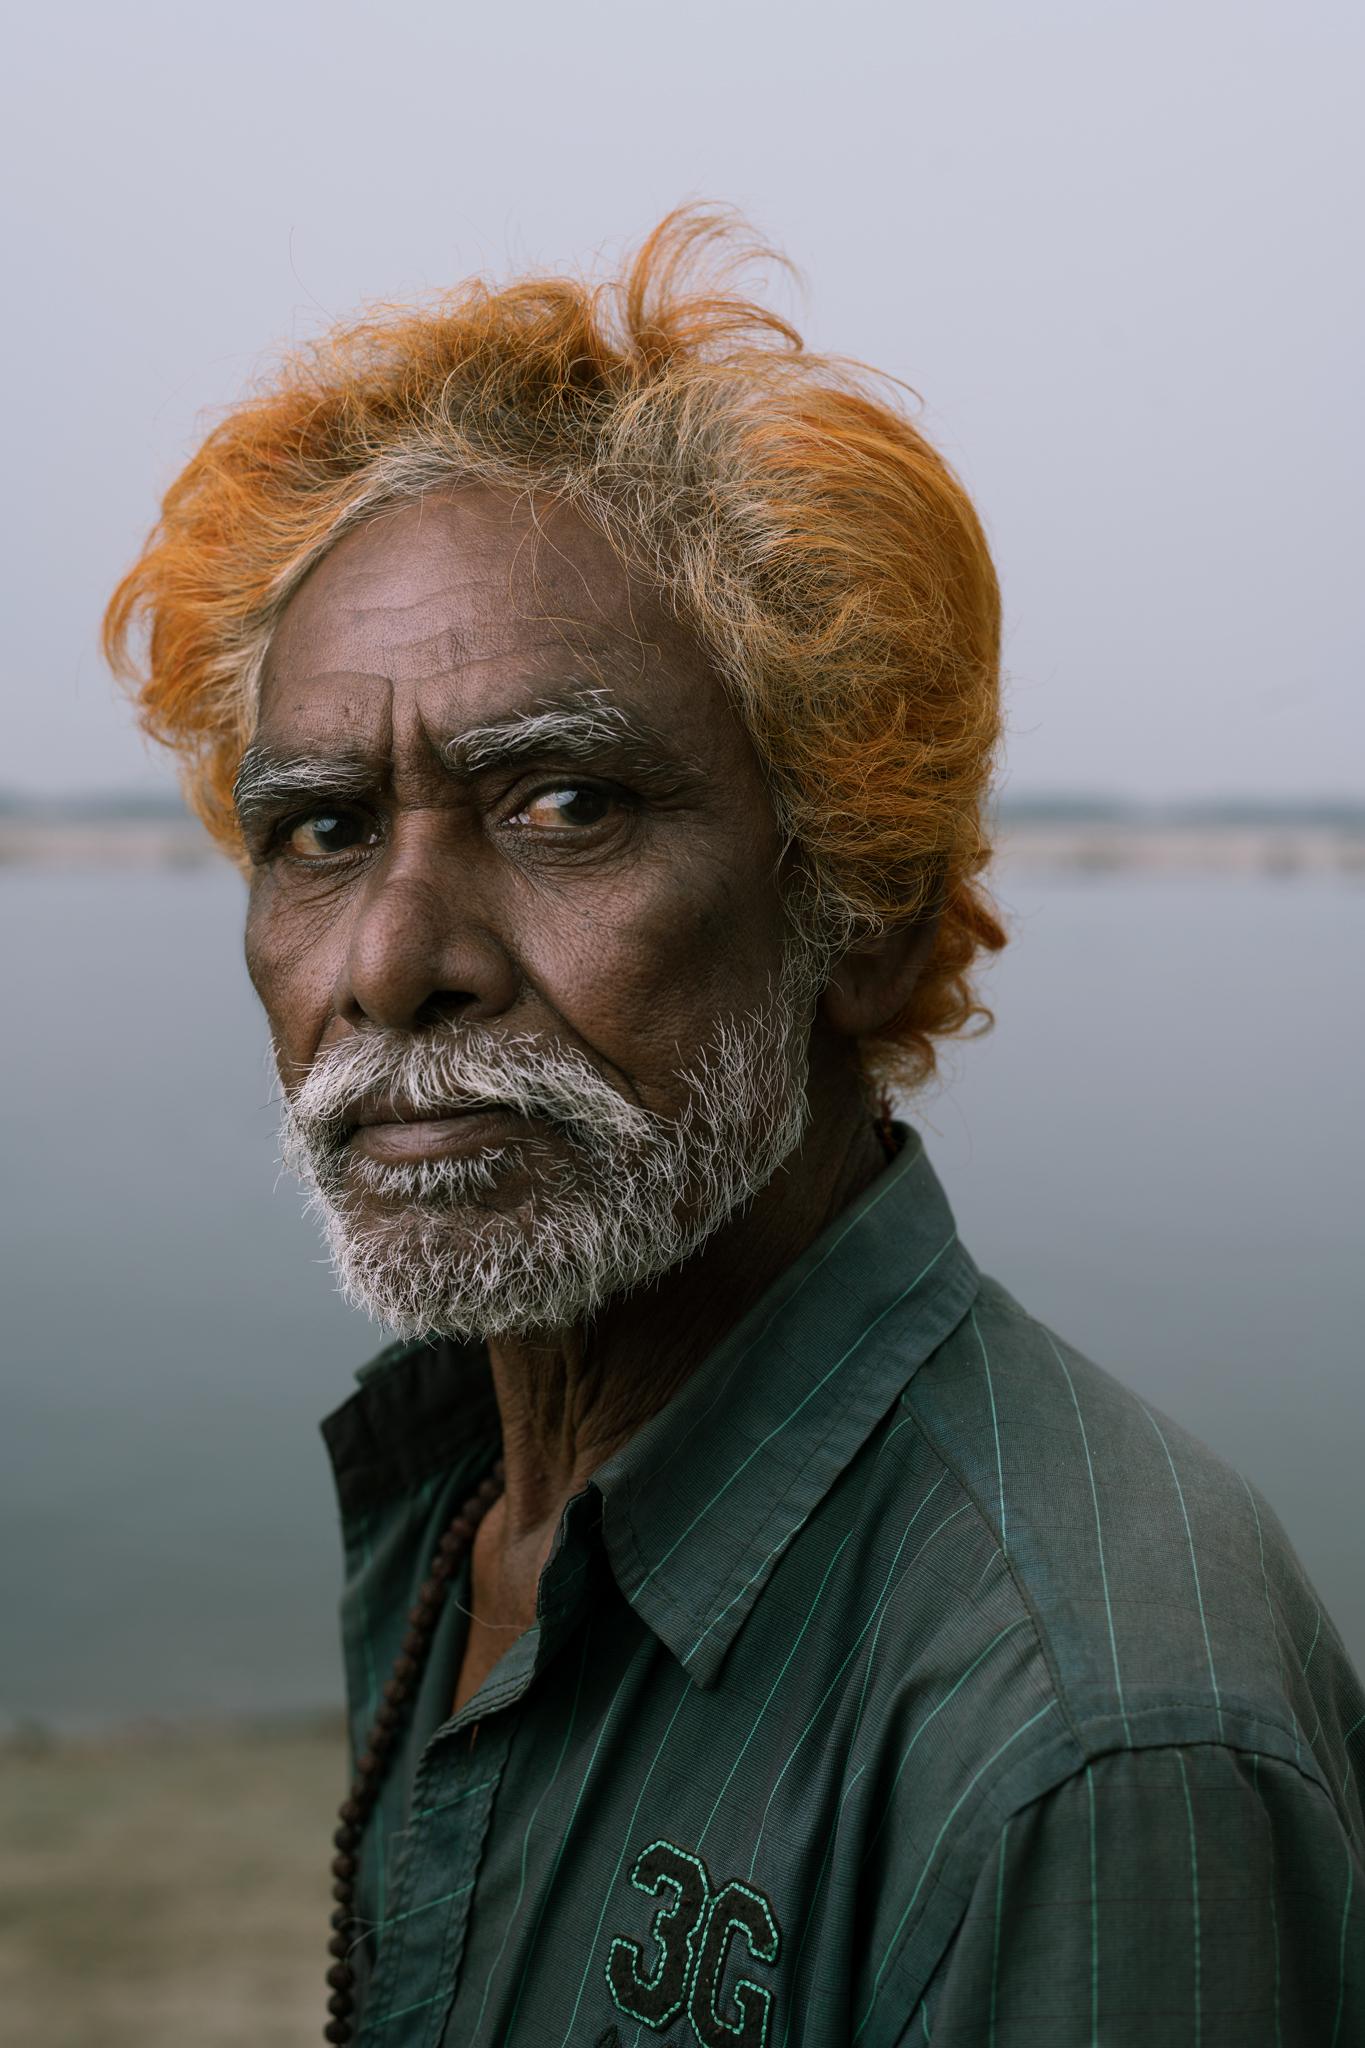 Varanasi_portrait_travel_photography_Manchester_Adventure_Photographer_Jan_Bella7.jpg